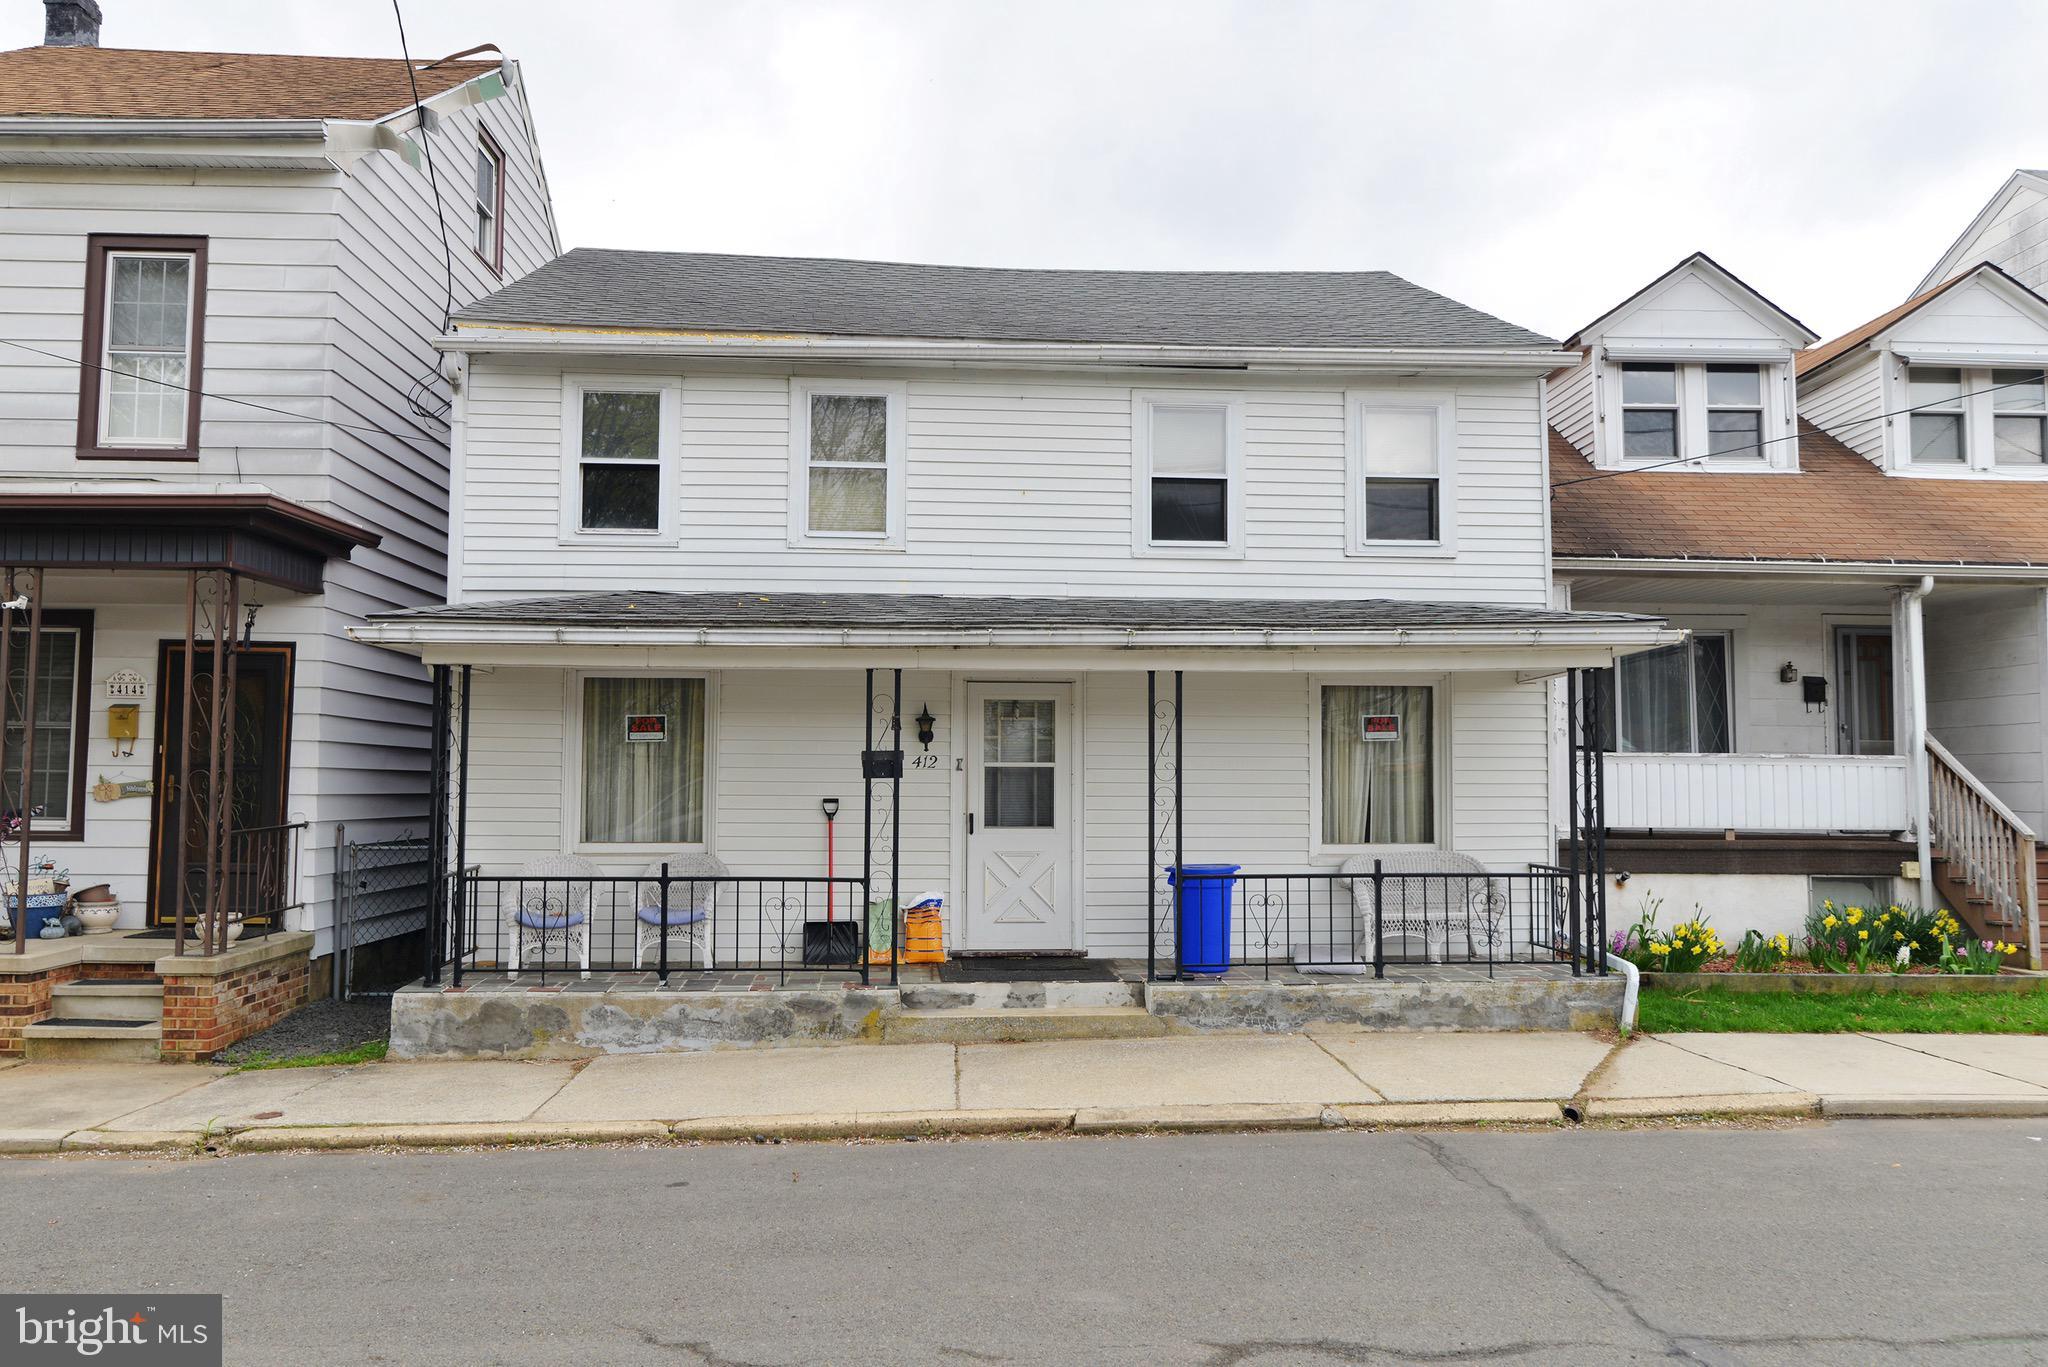 410 S FRONT STREET, SAINT CLAIR, PA 17970